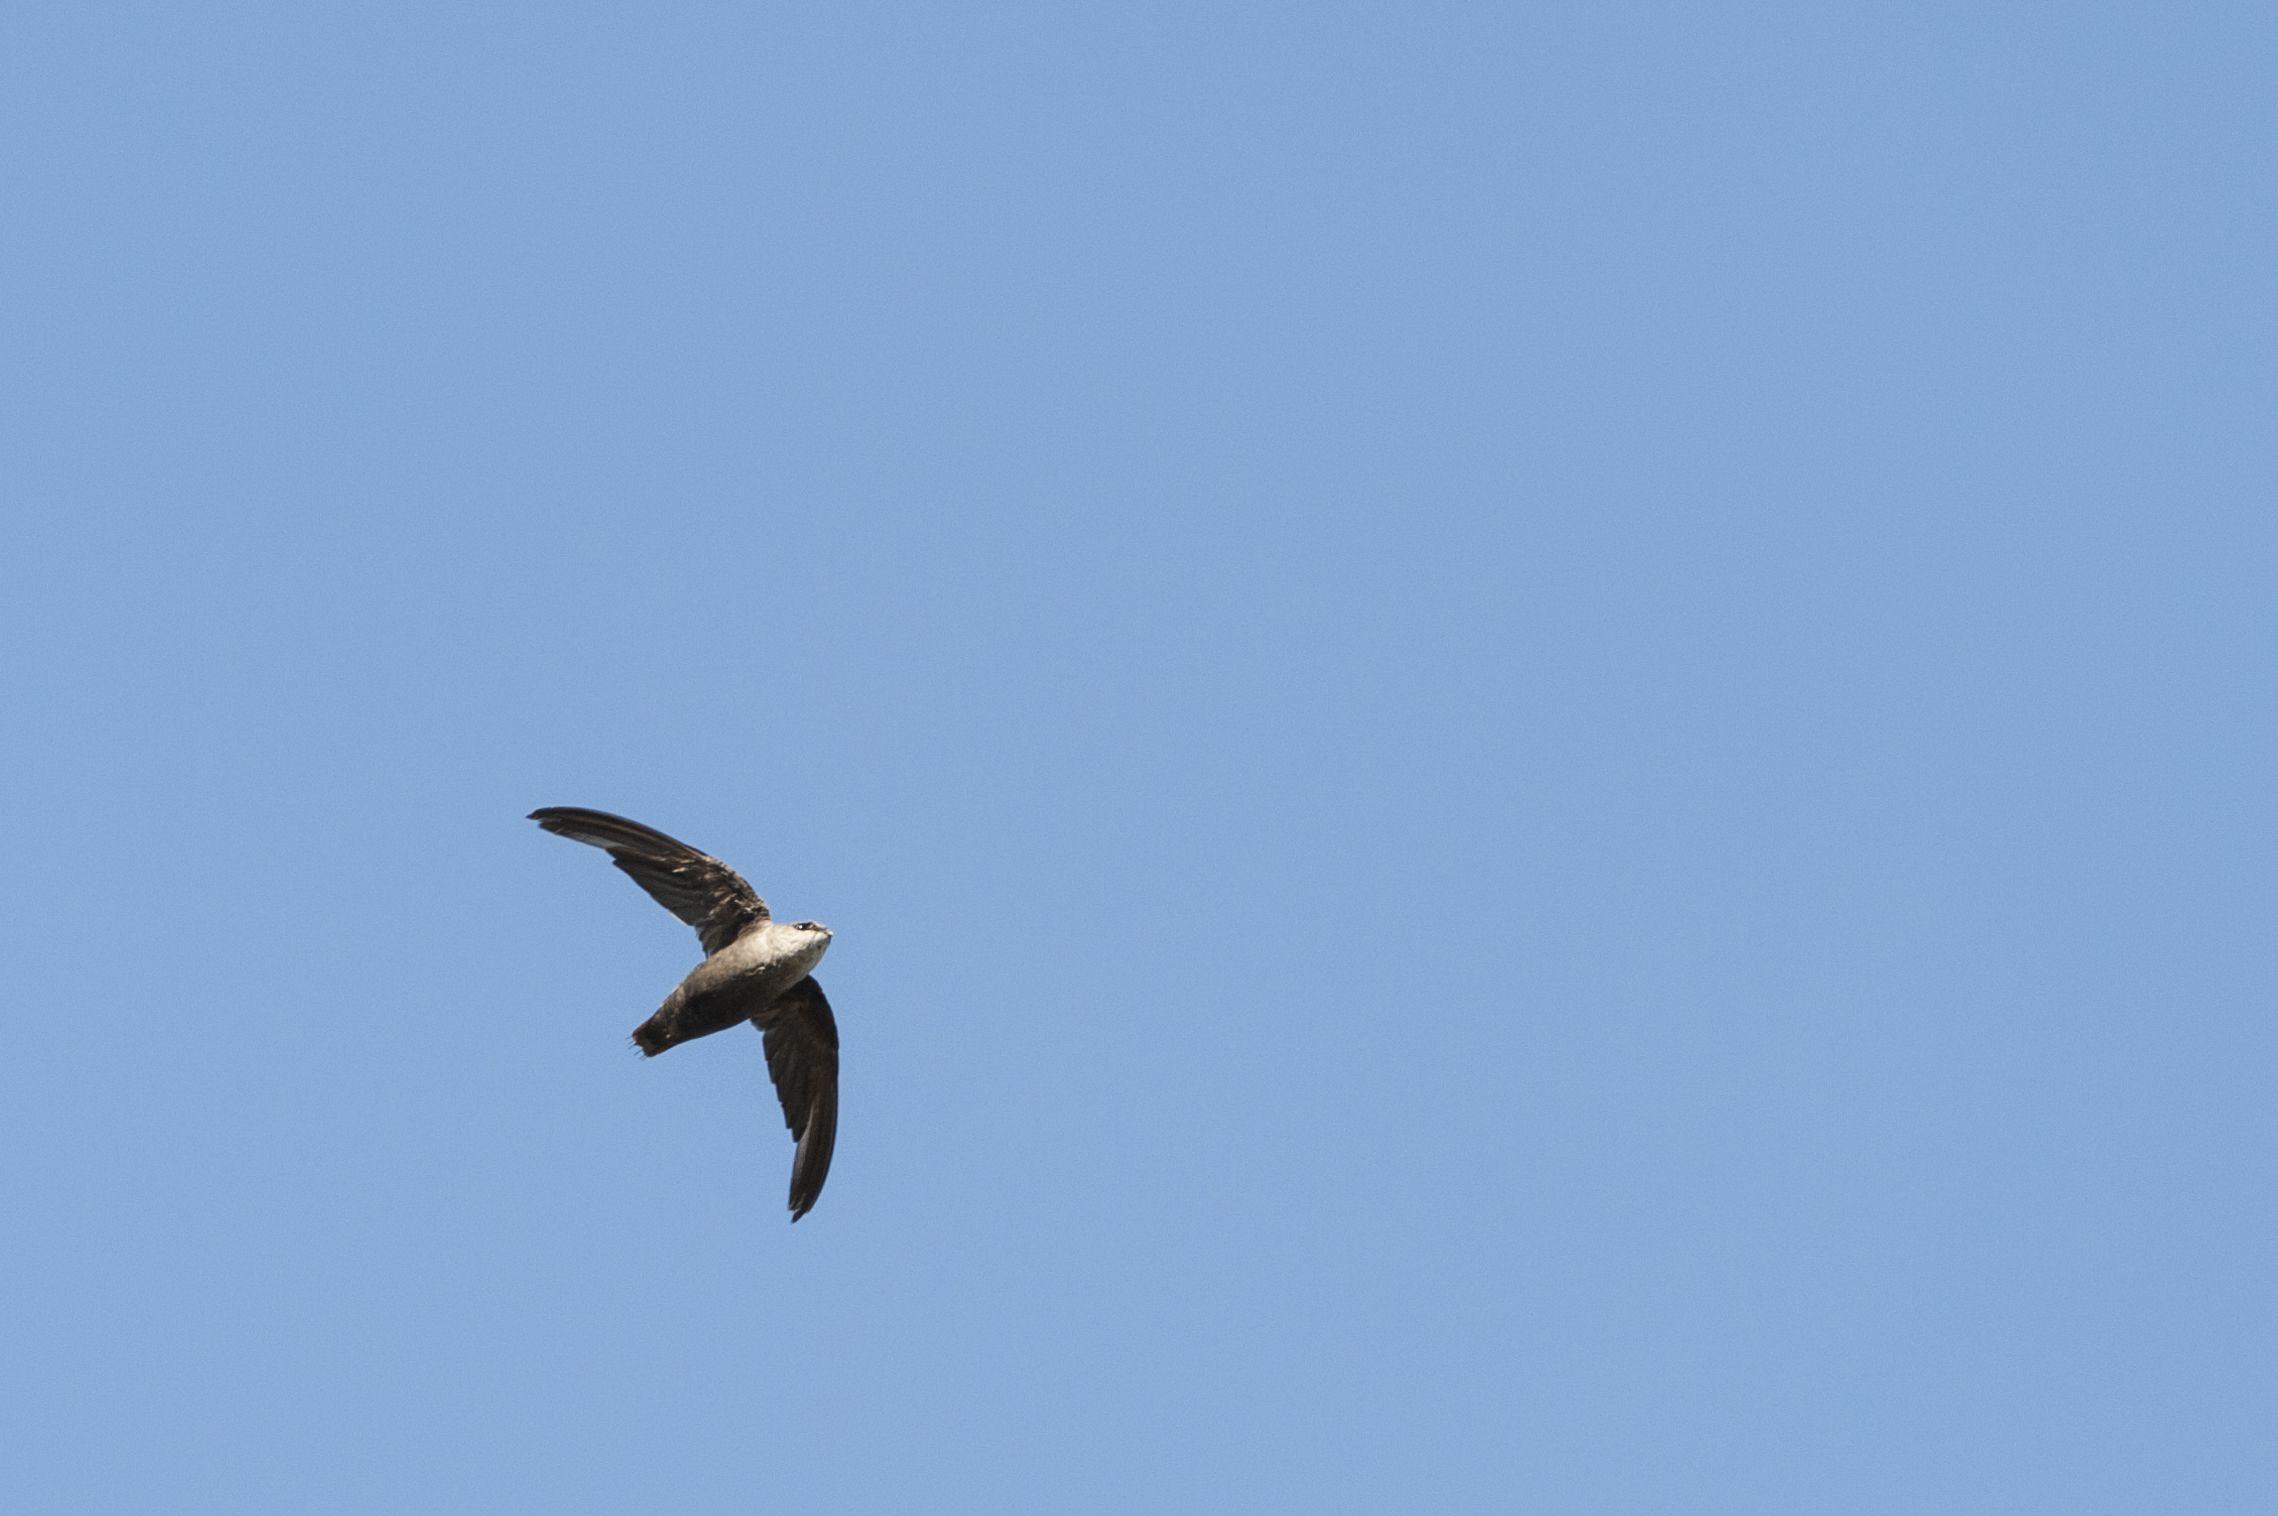 Chimney Swift flying overhead